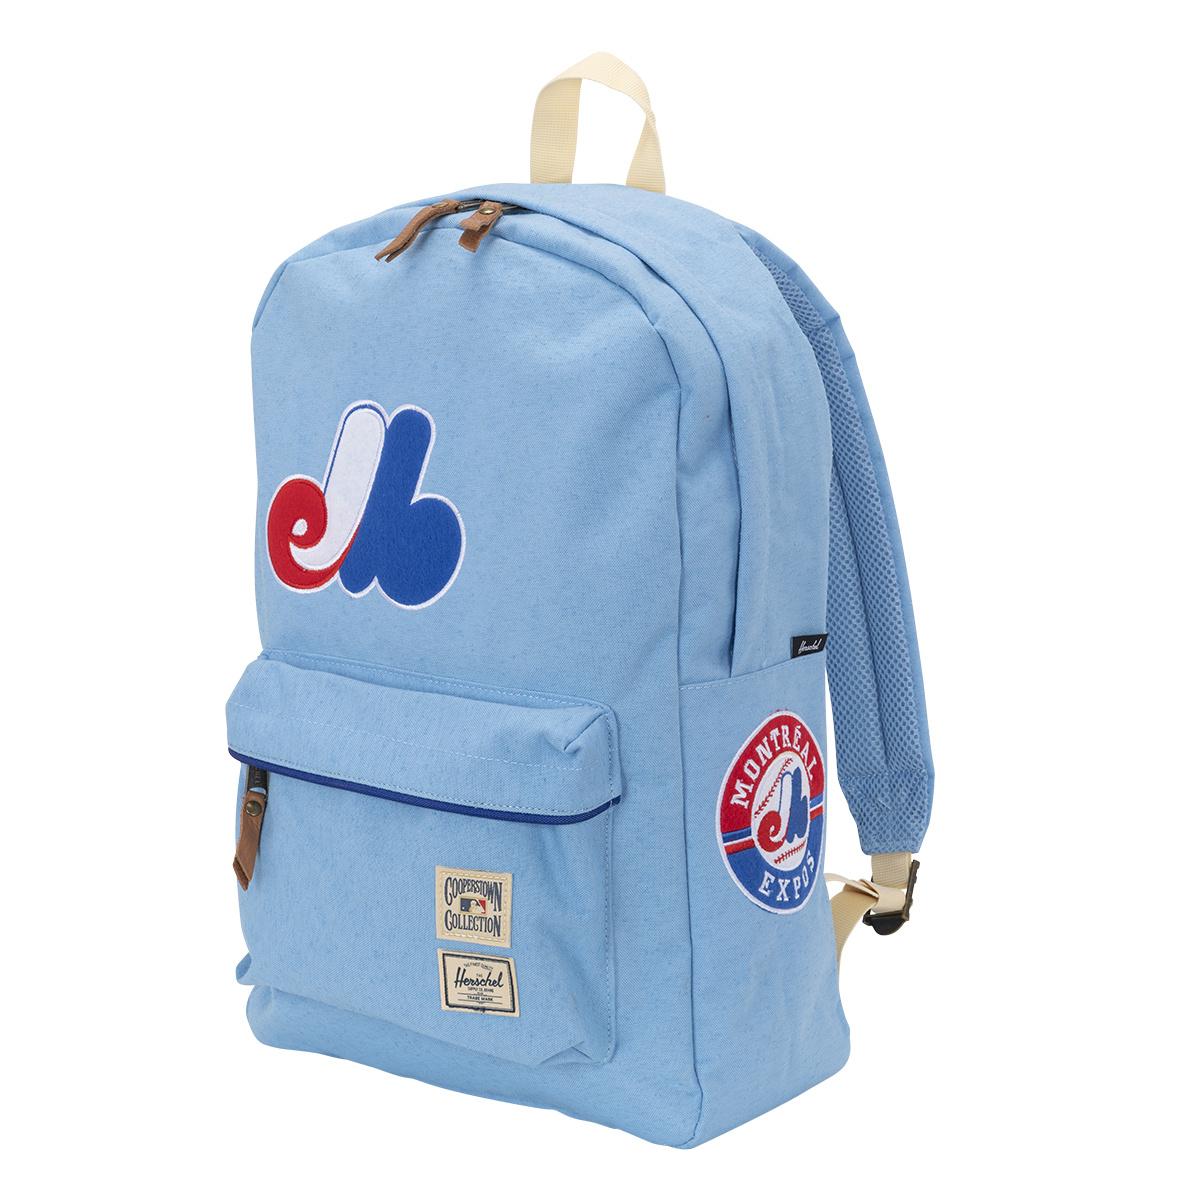 Expos Herschel Backpack ∣ Tricolore Sports